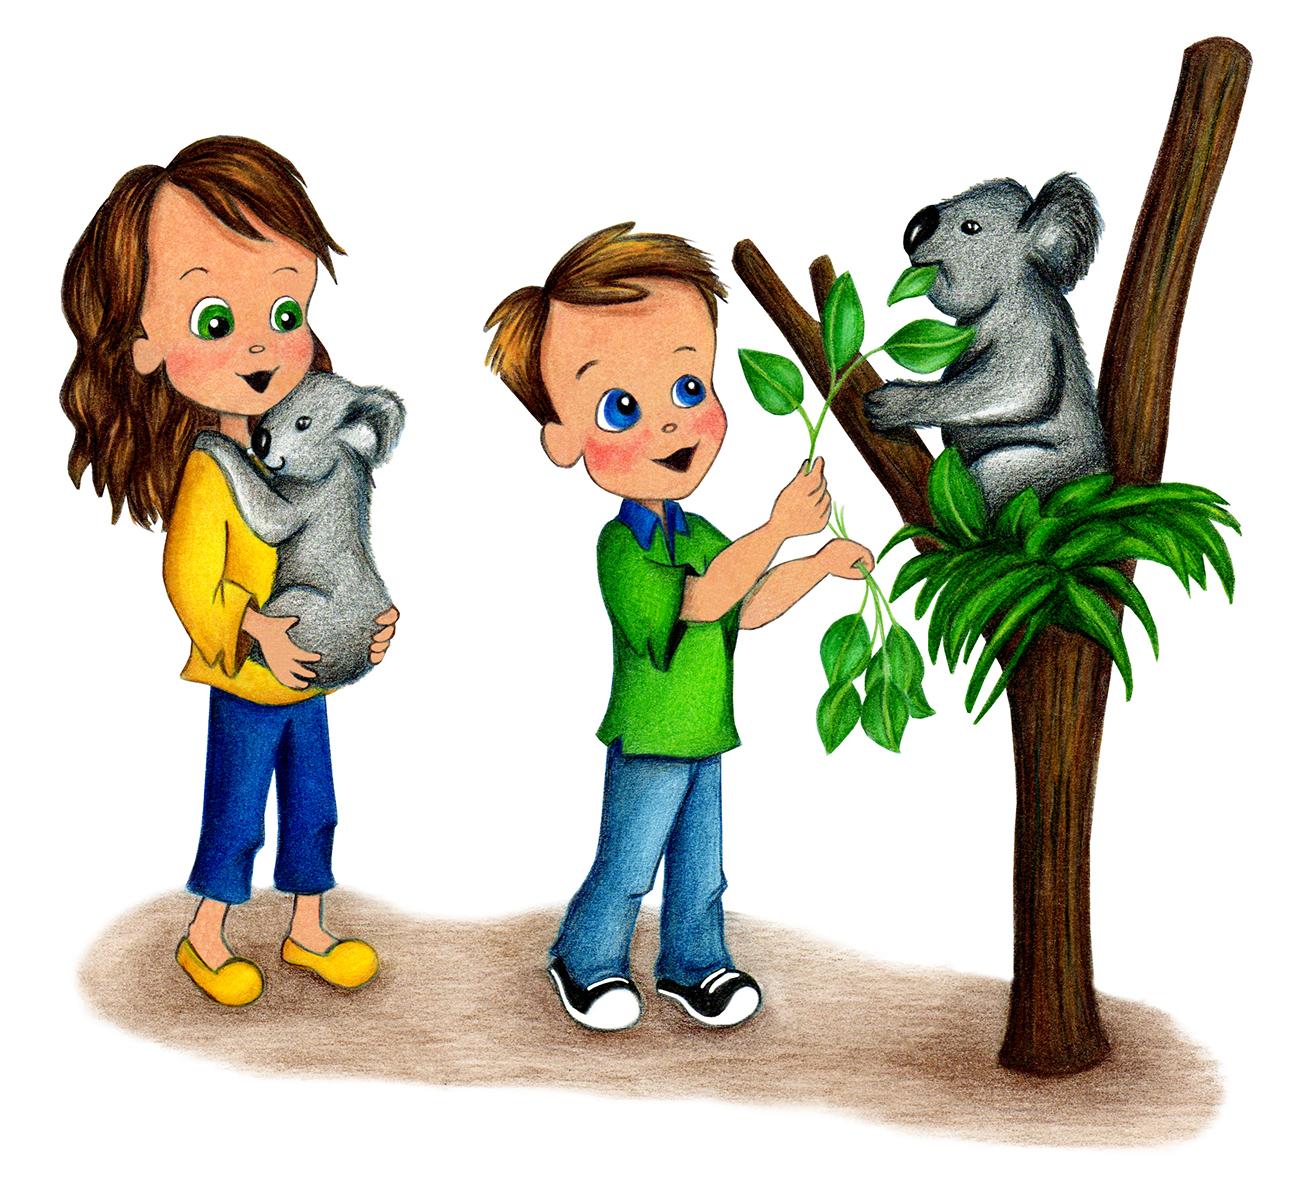 Koala illustration in Molly Goes to Sydney